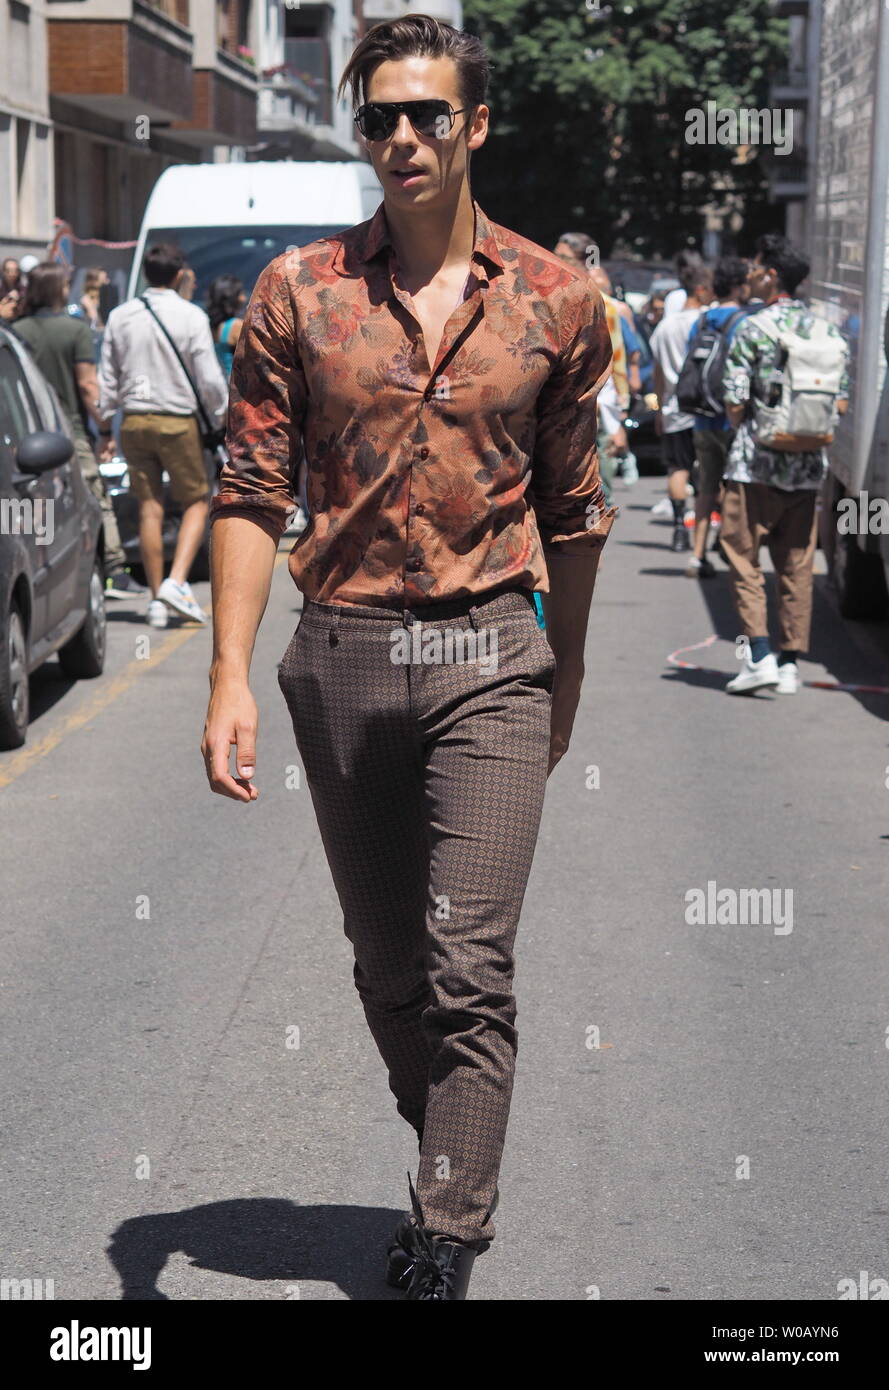 MILANO, Italie  16 Juin 2019  blogueurs de la mode street